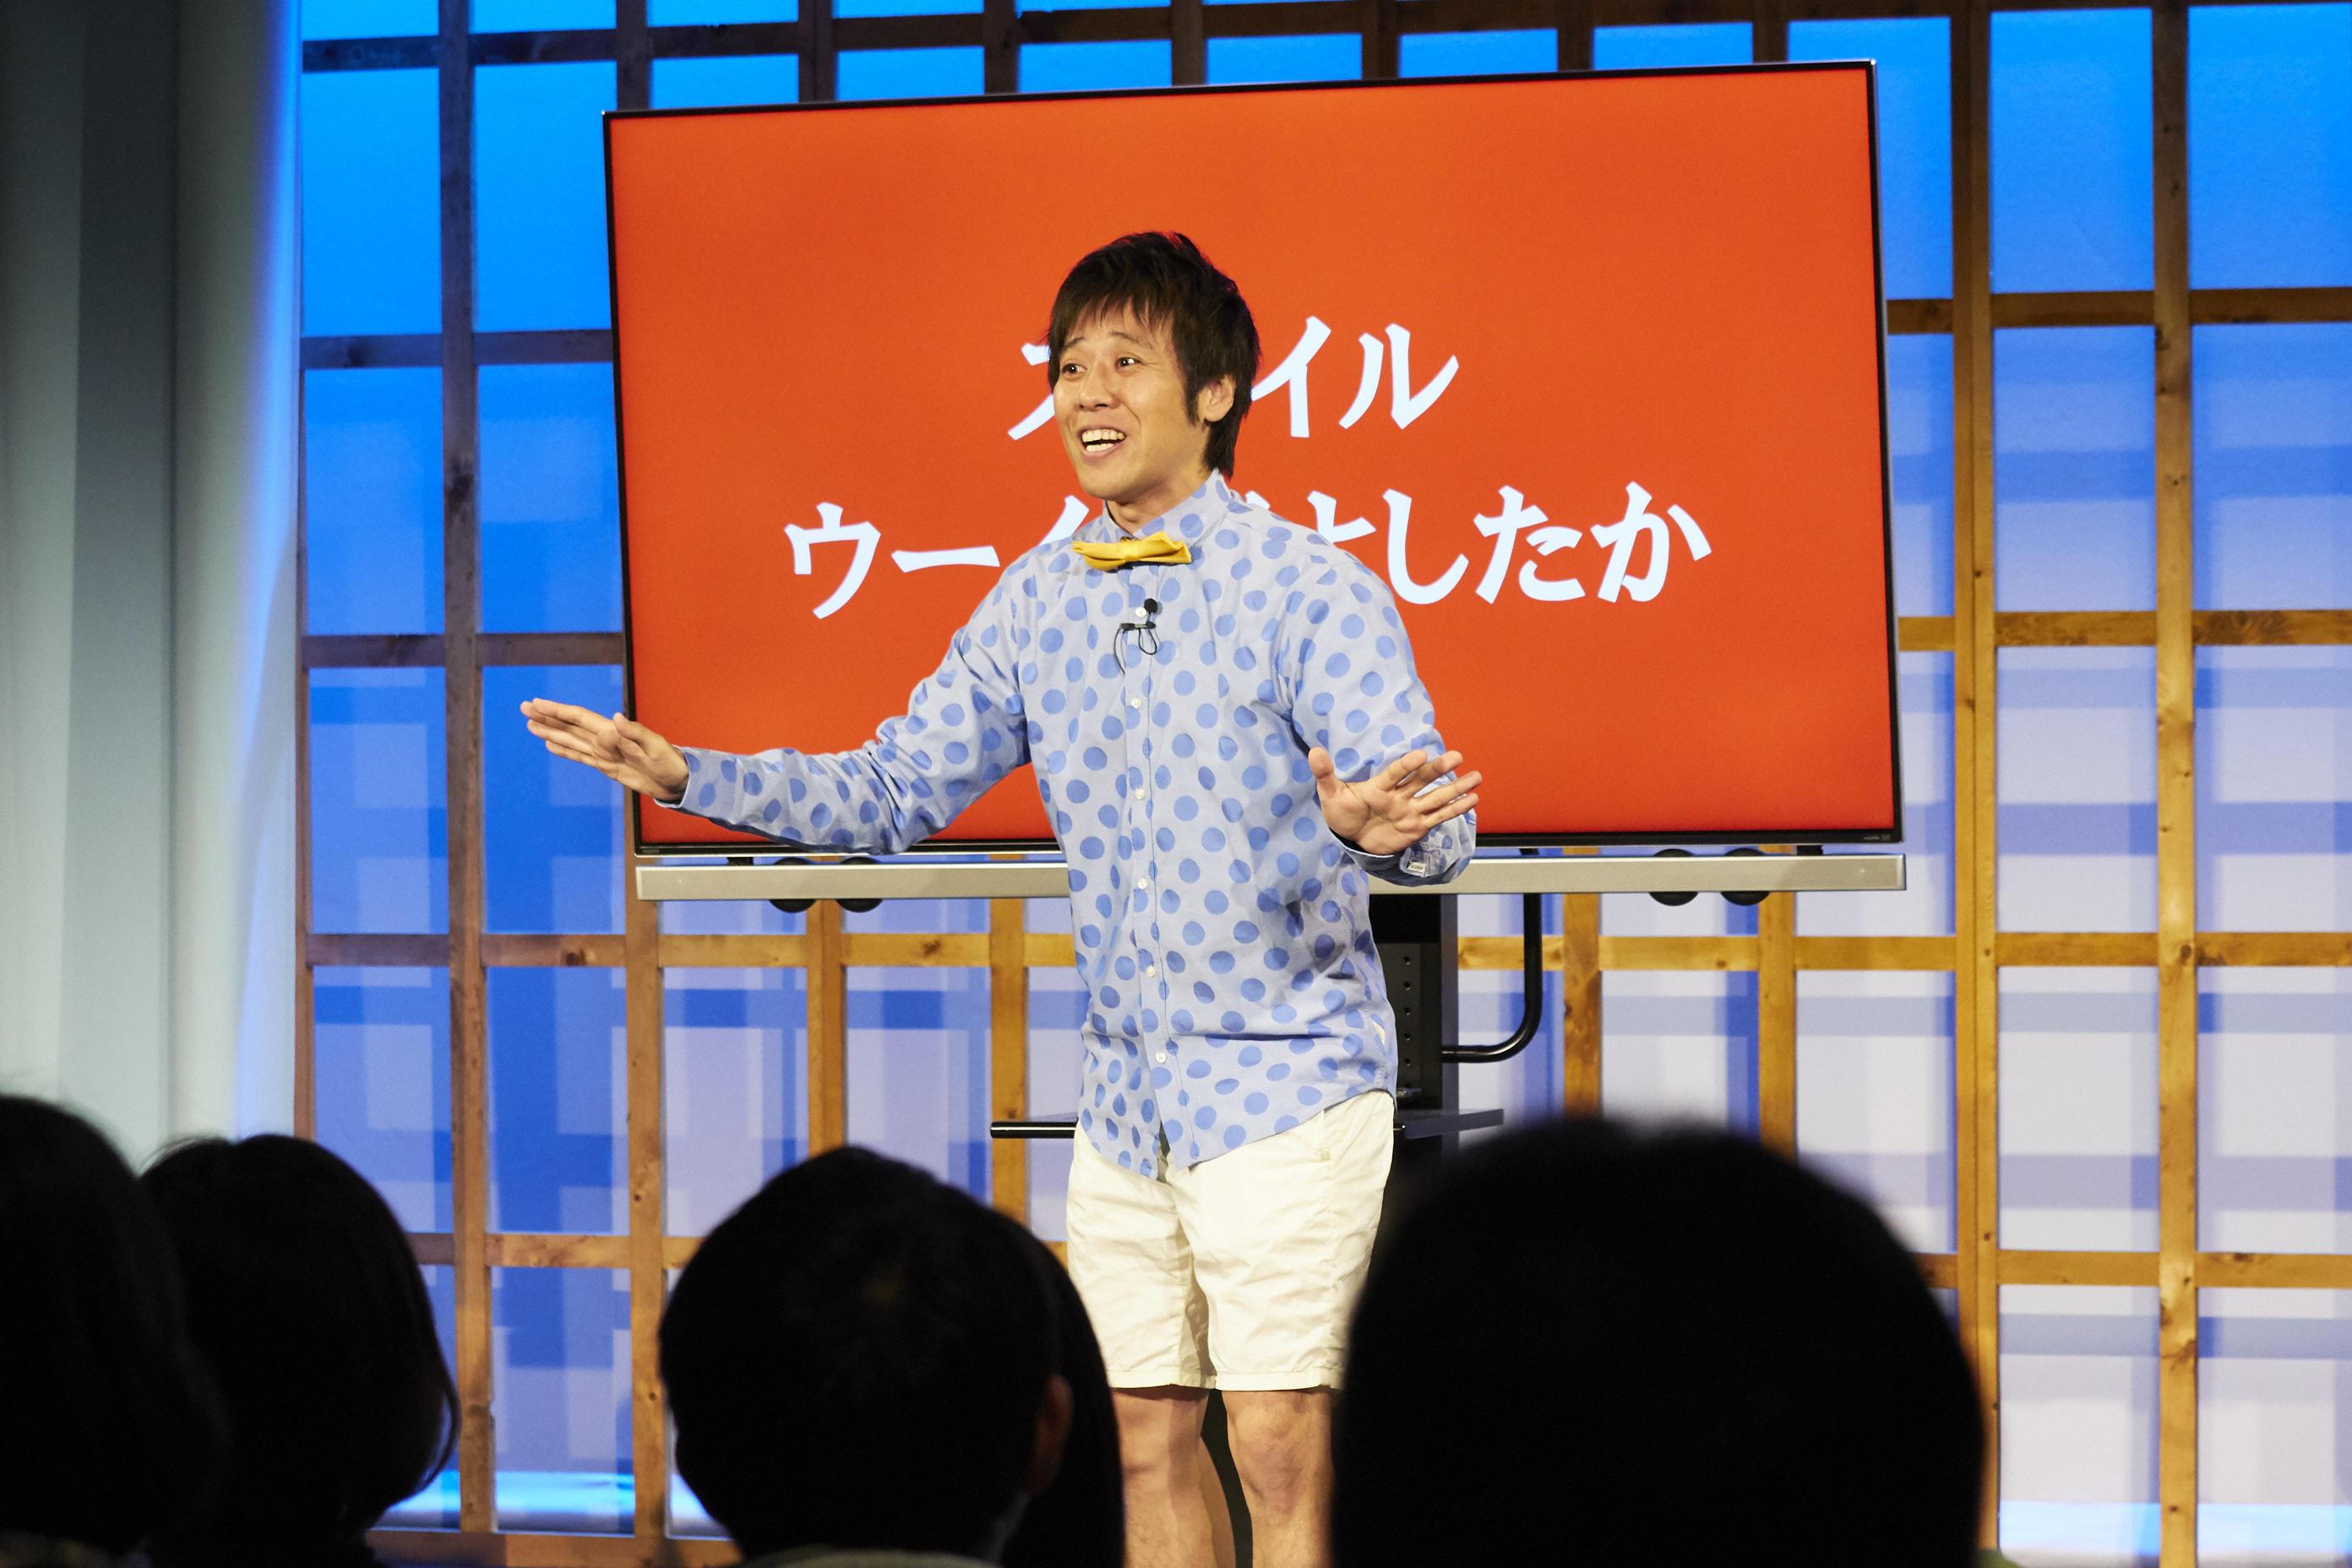 http://news.yoshimoto.co.jp/20180401094821-58f6c28959bc400cfbd38676a219f774af3f6173.jpg